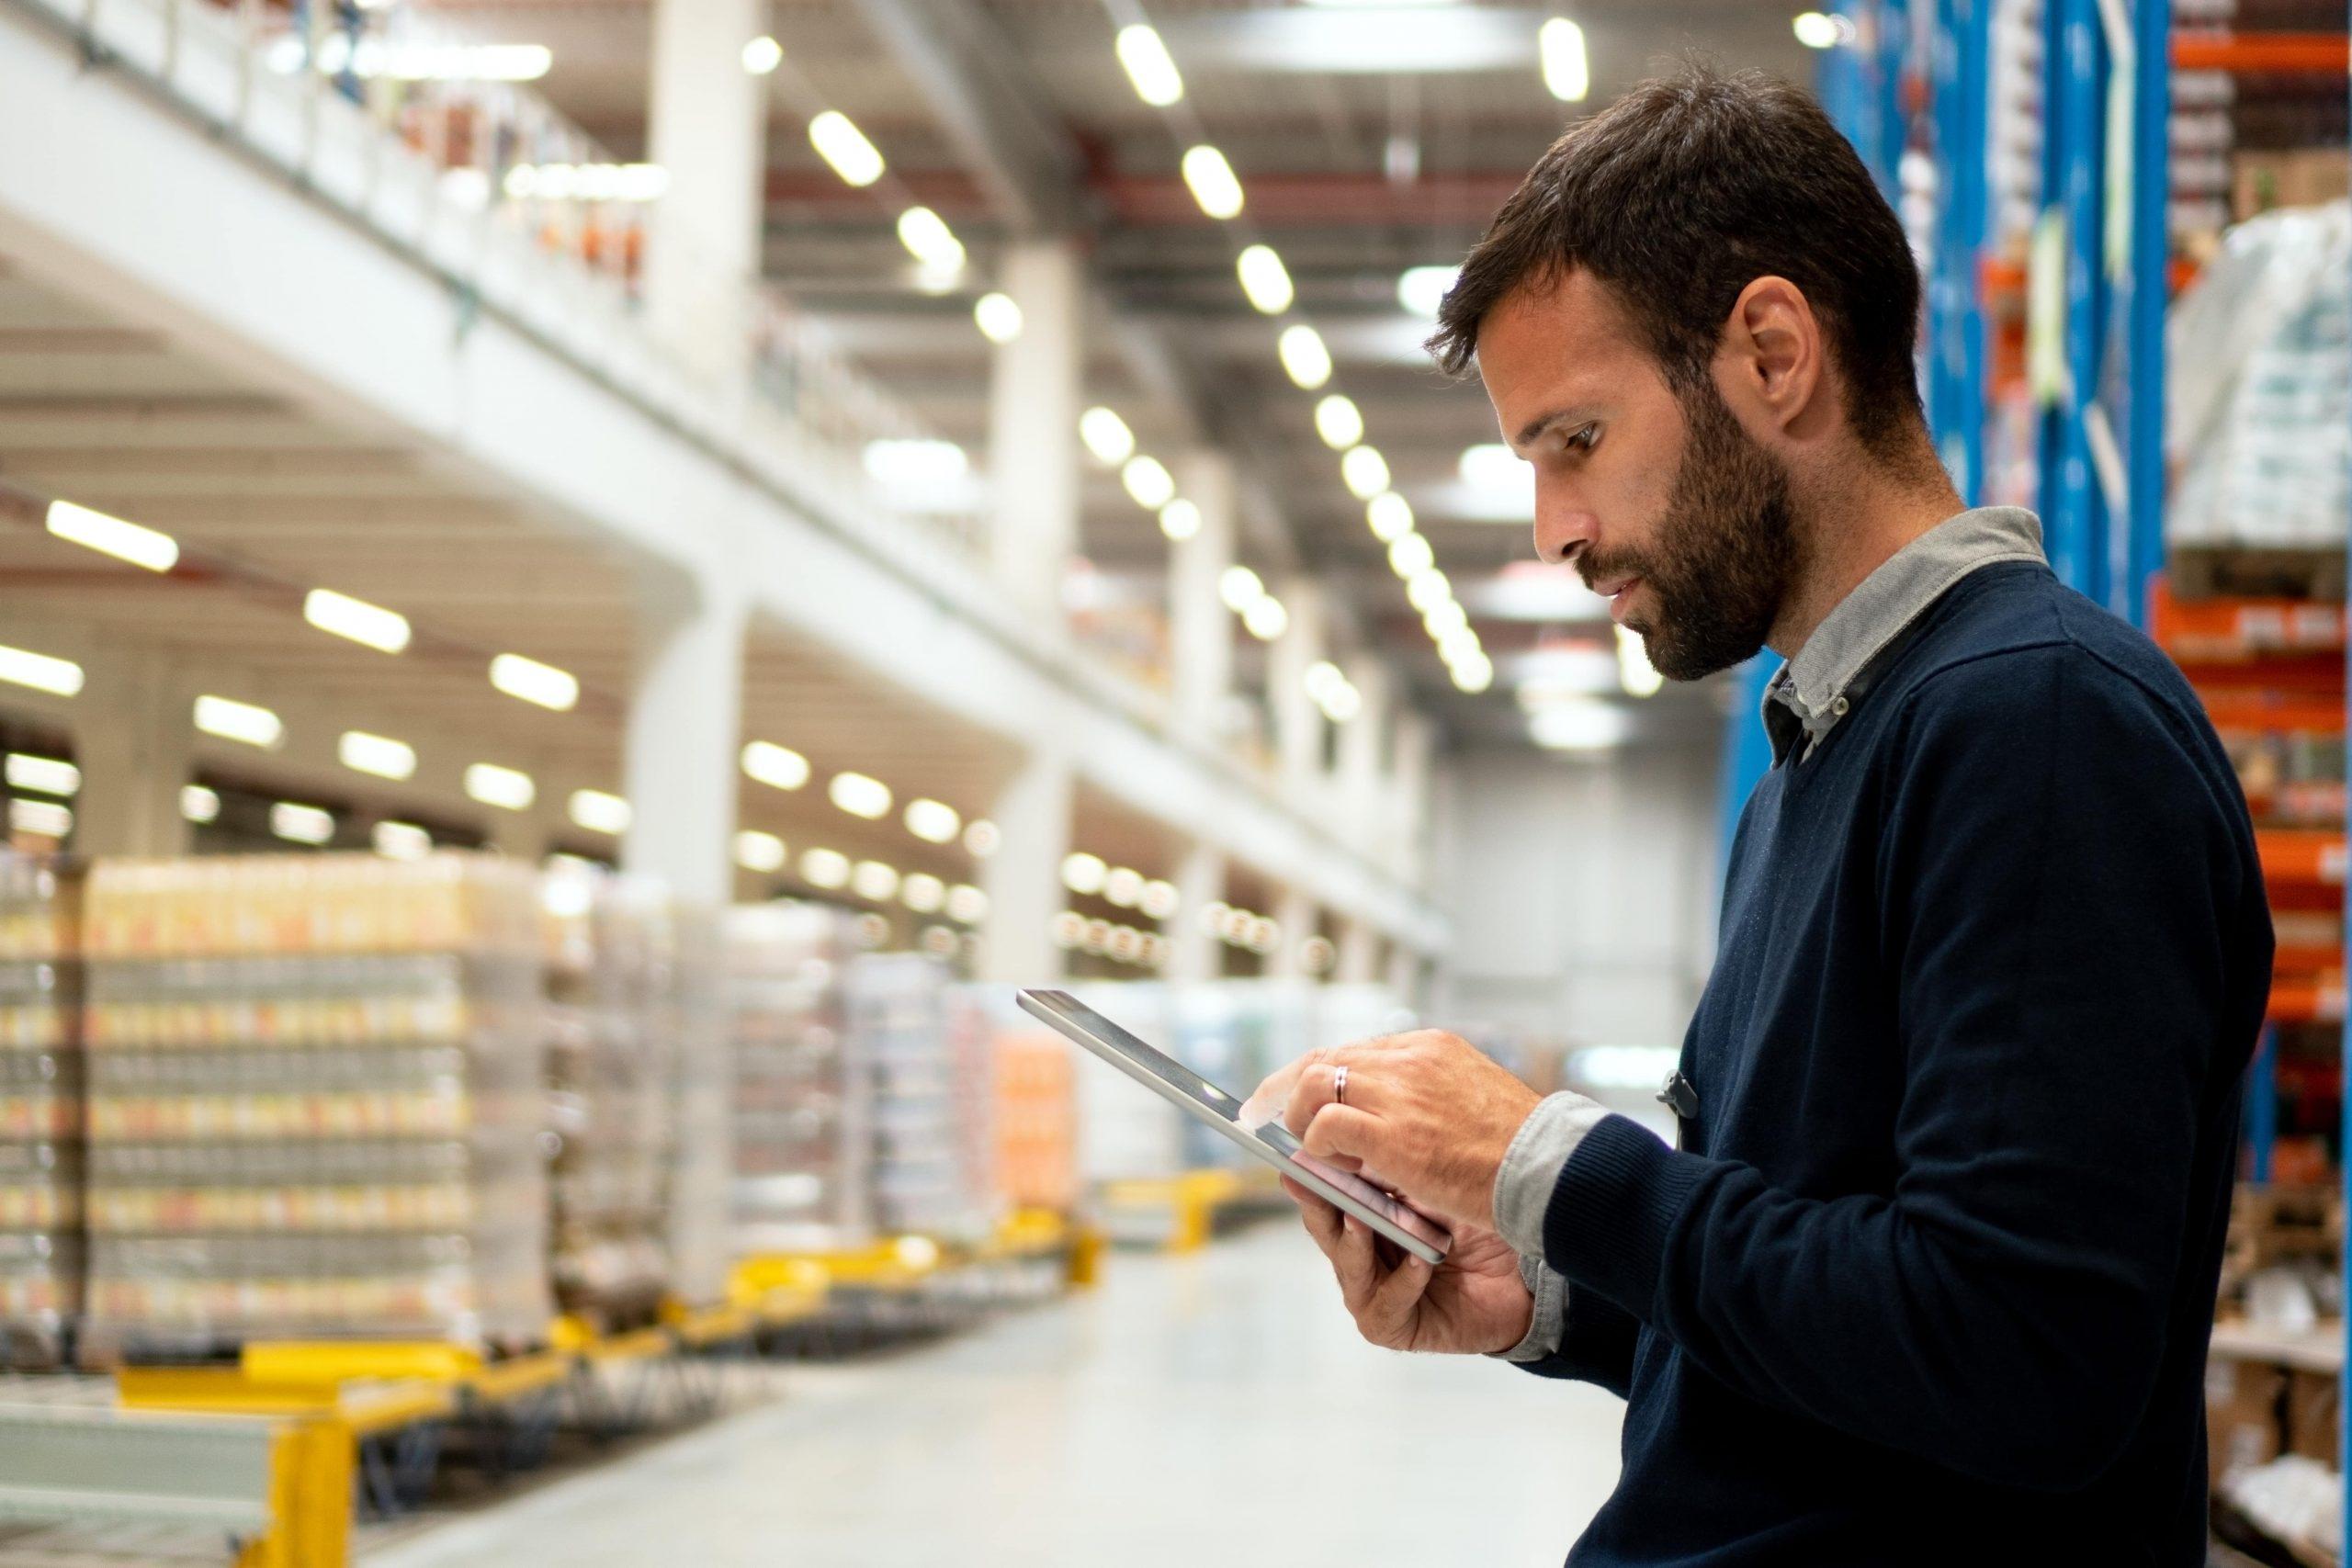 Outsourcing gestión de compras